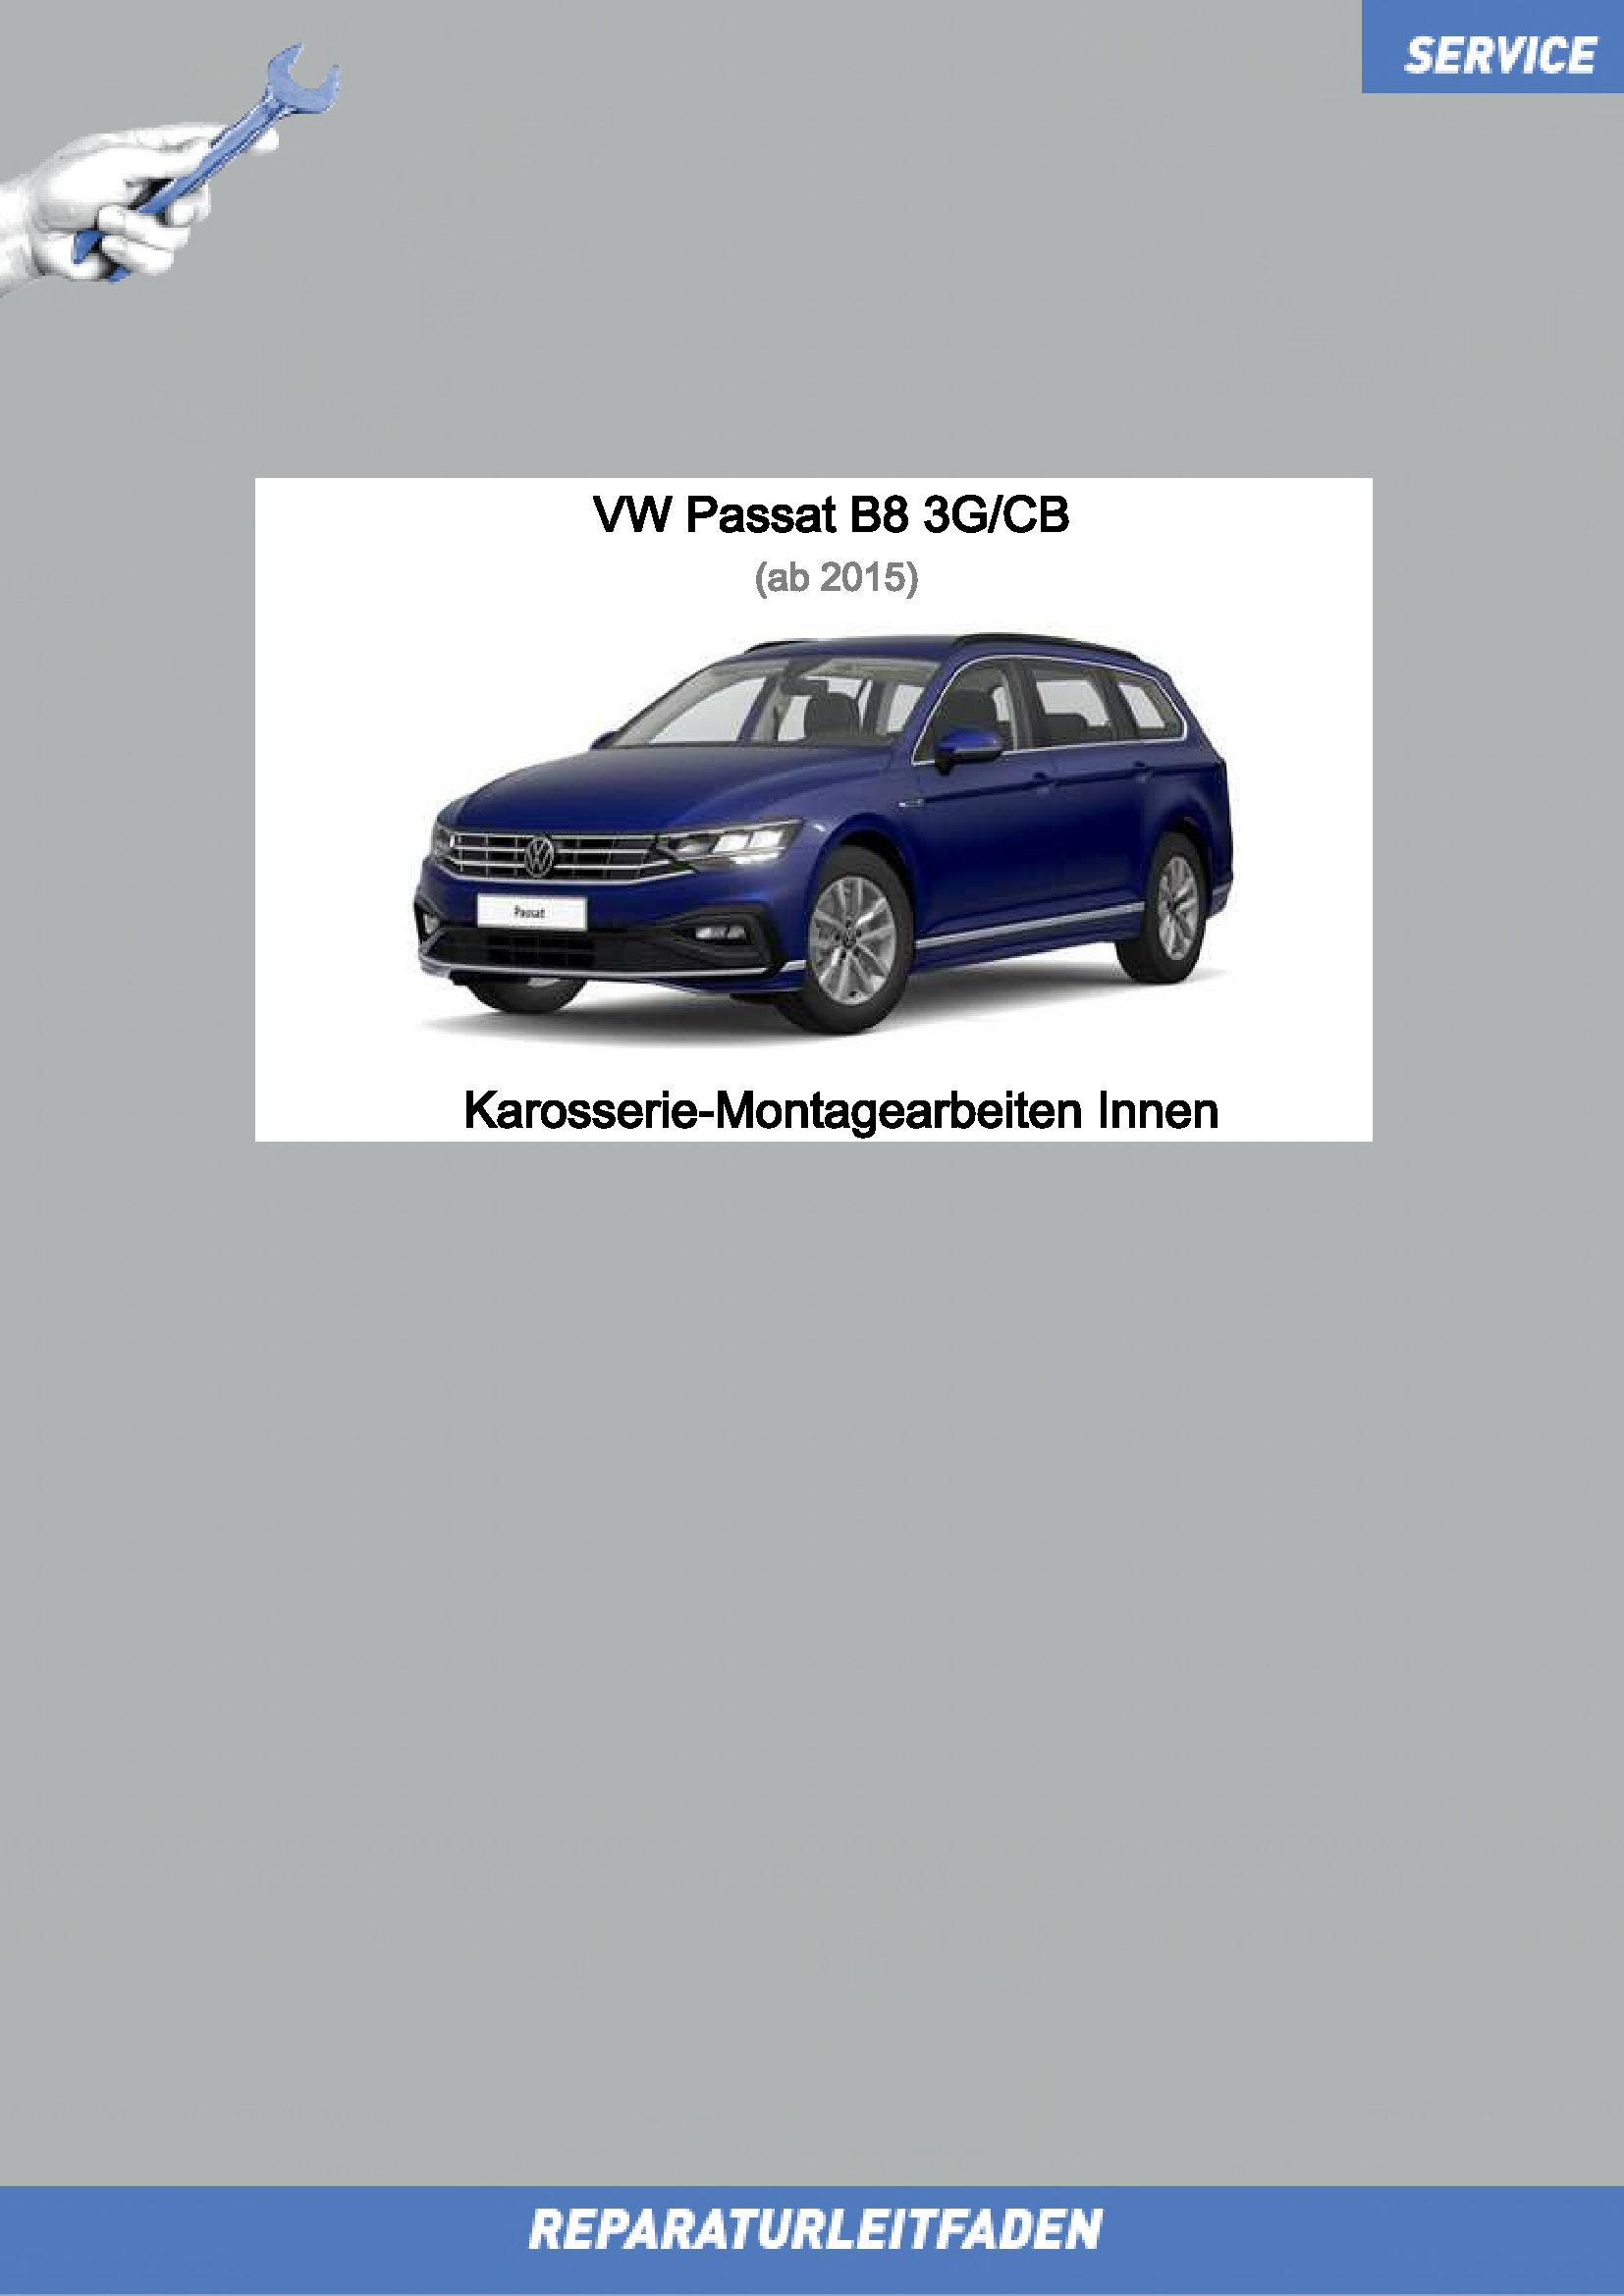 vw-passat-3g-0002-karosserie_montagearbeiten_innen_1.png